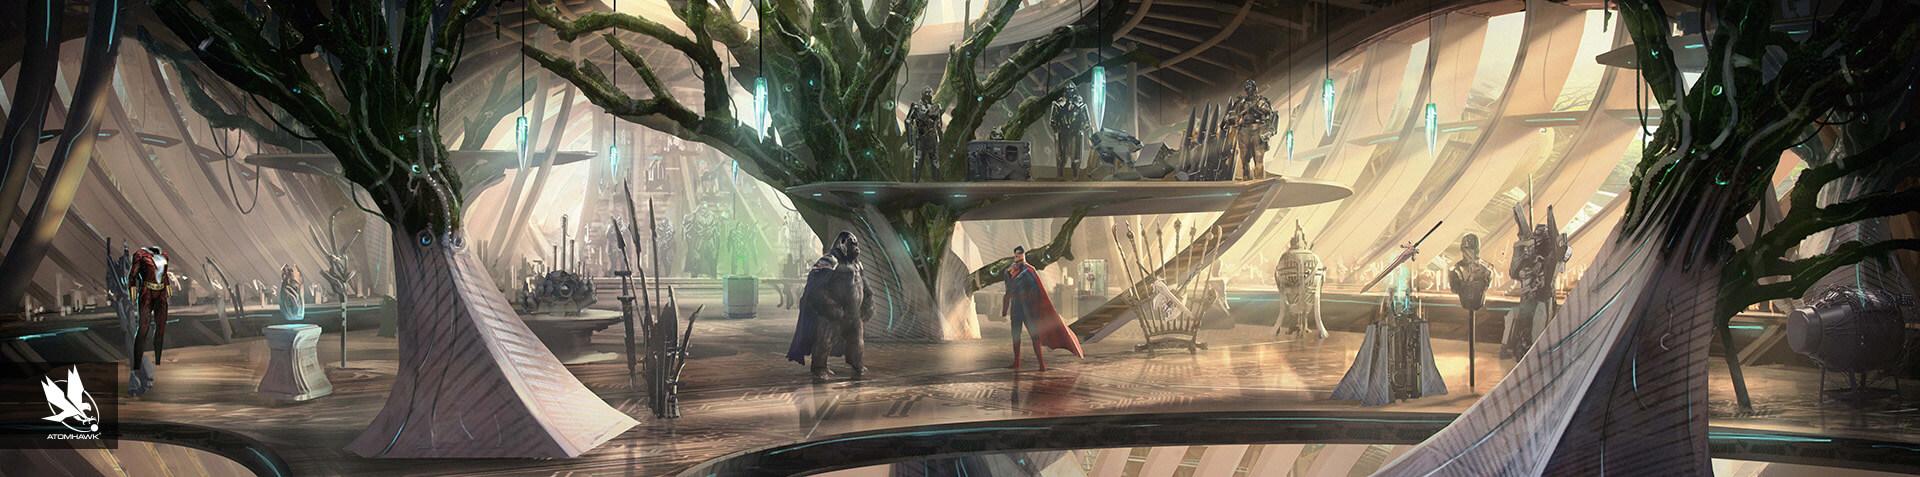 Environment Design - Injustice2 - Gorilla City - Grodds Trophy Room